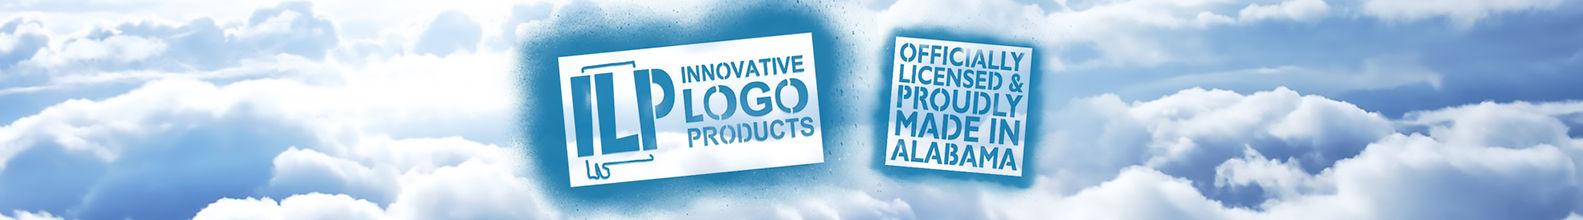 Innovative Logo Products Collegiate Home Decor